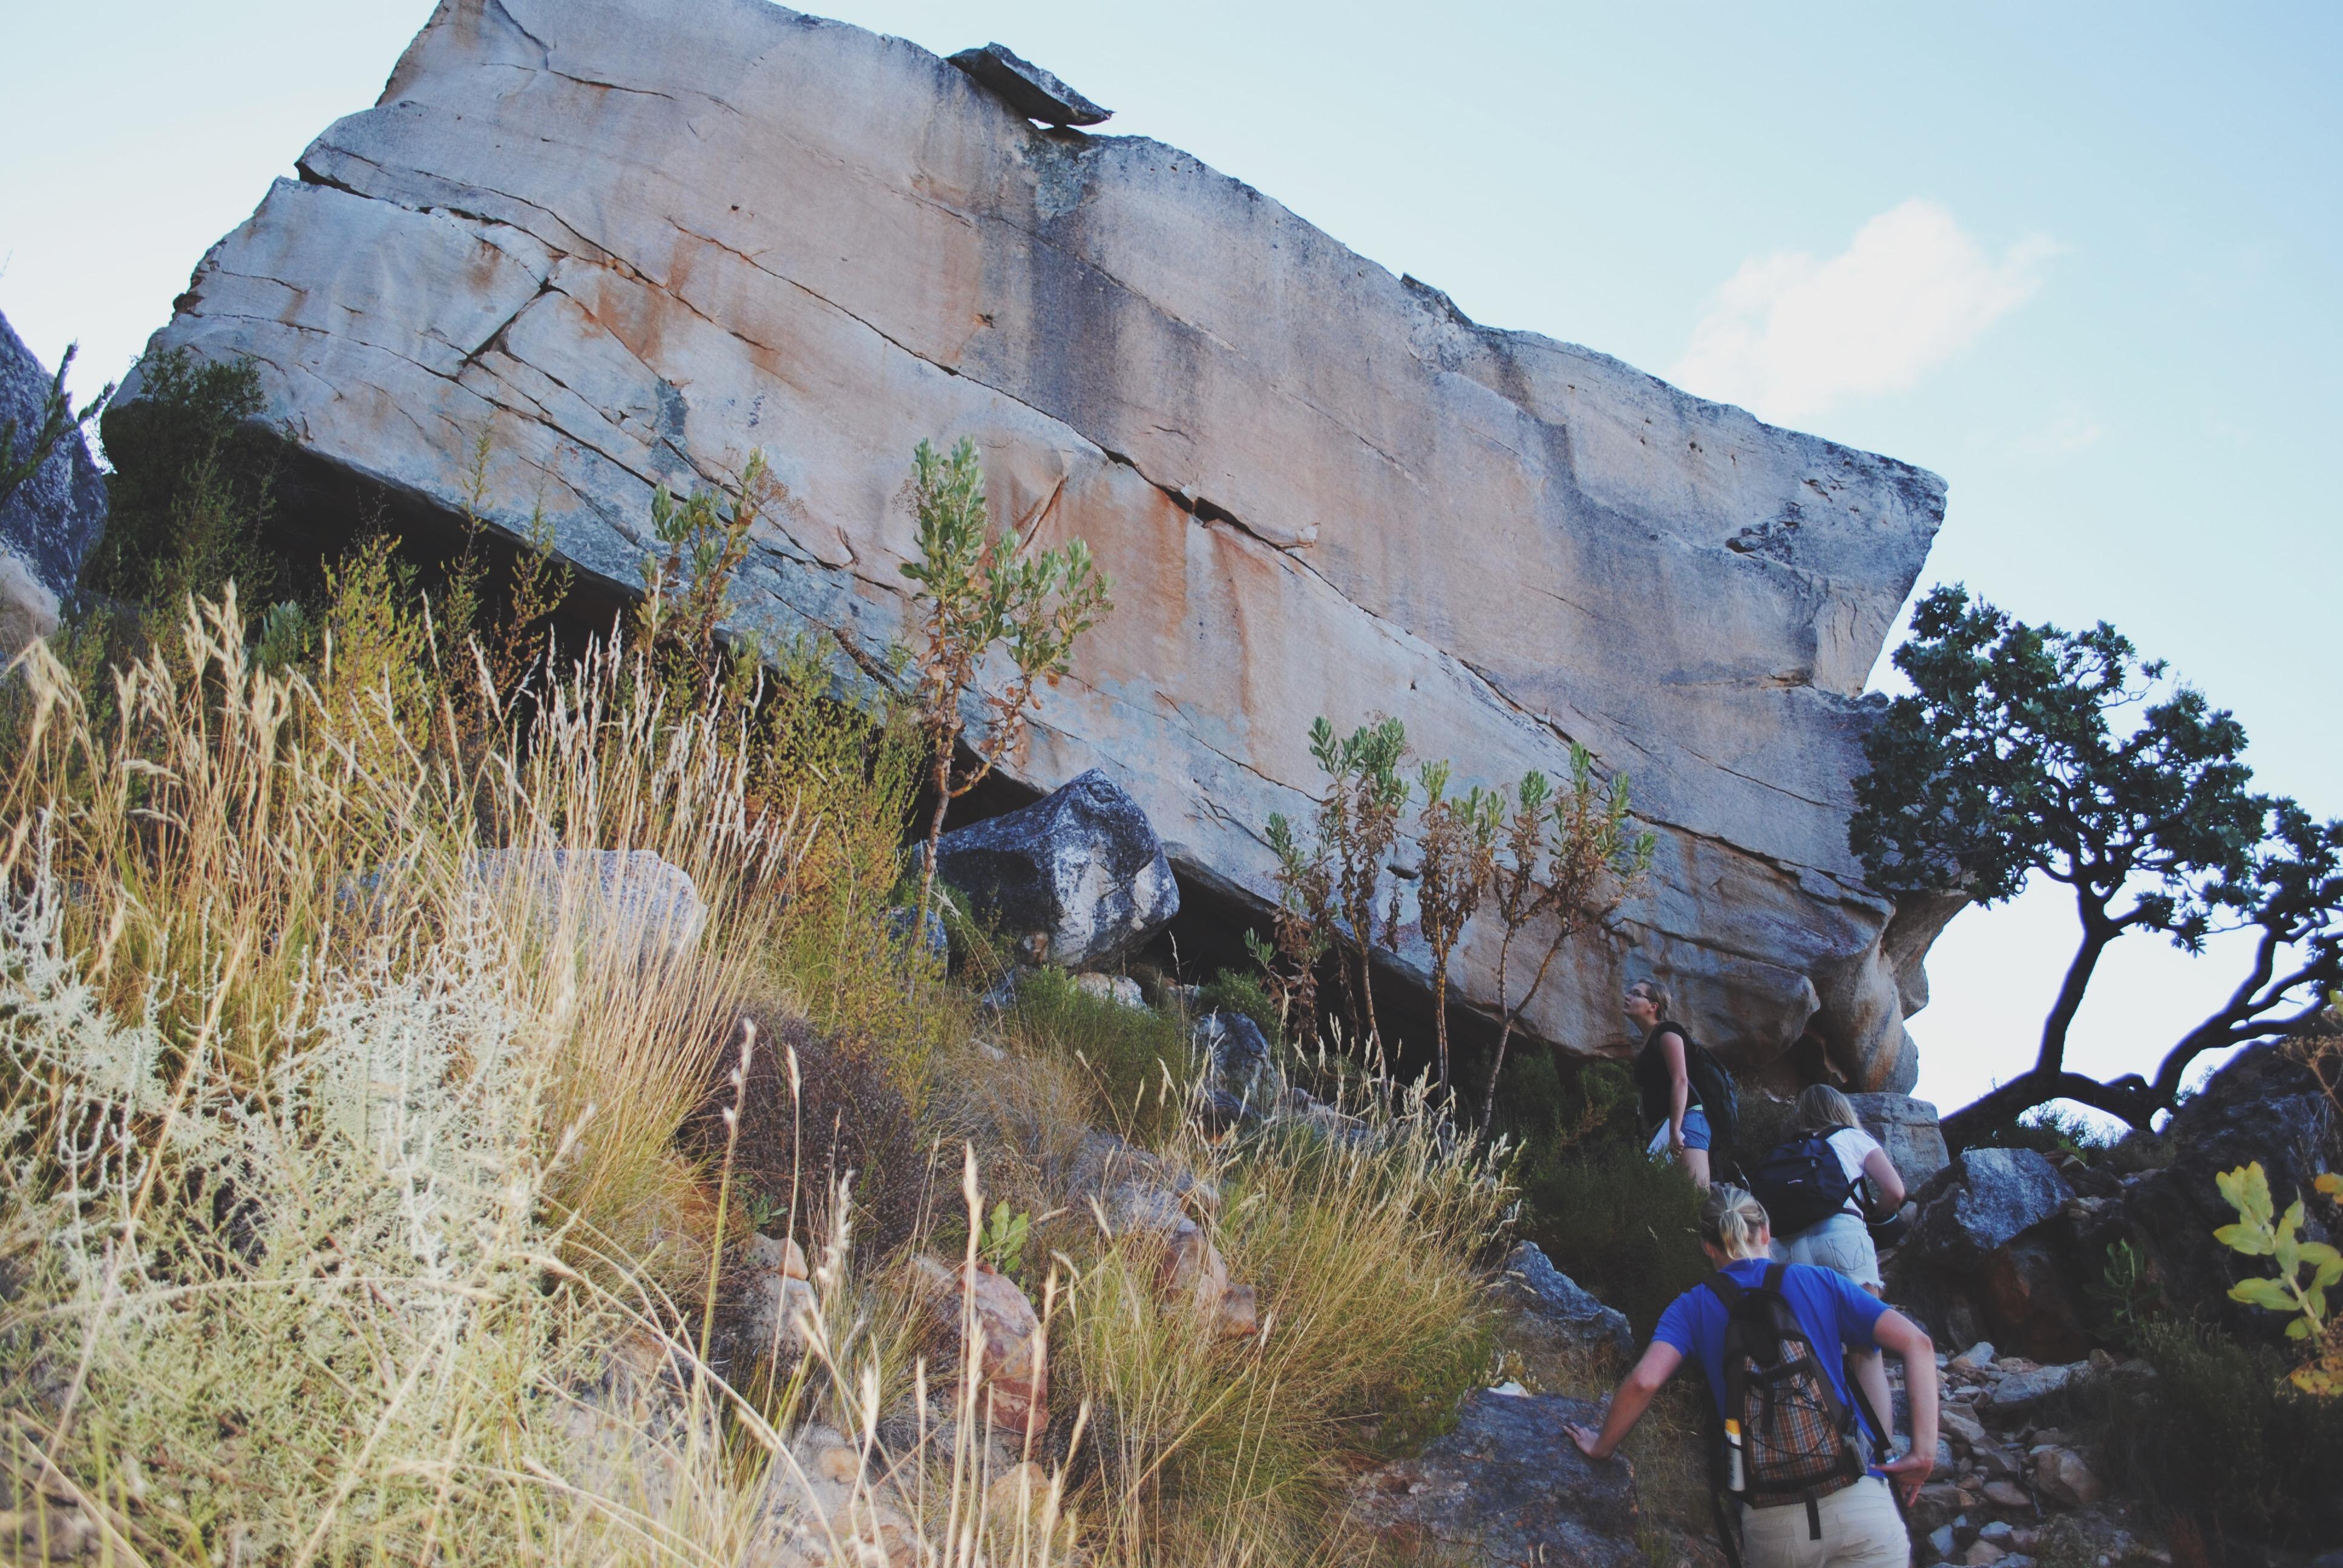 Travel Diary Sederbergen Zuid-Afrika 8